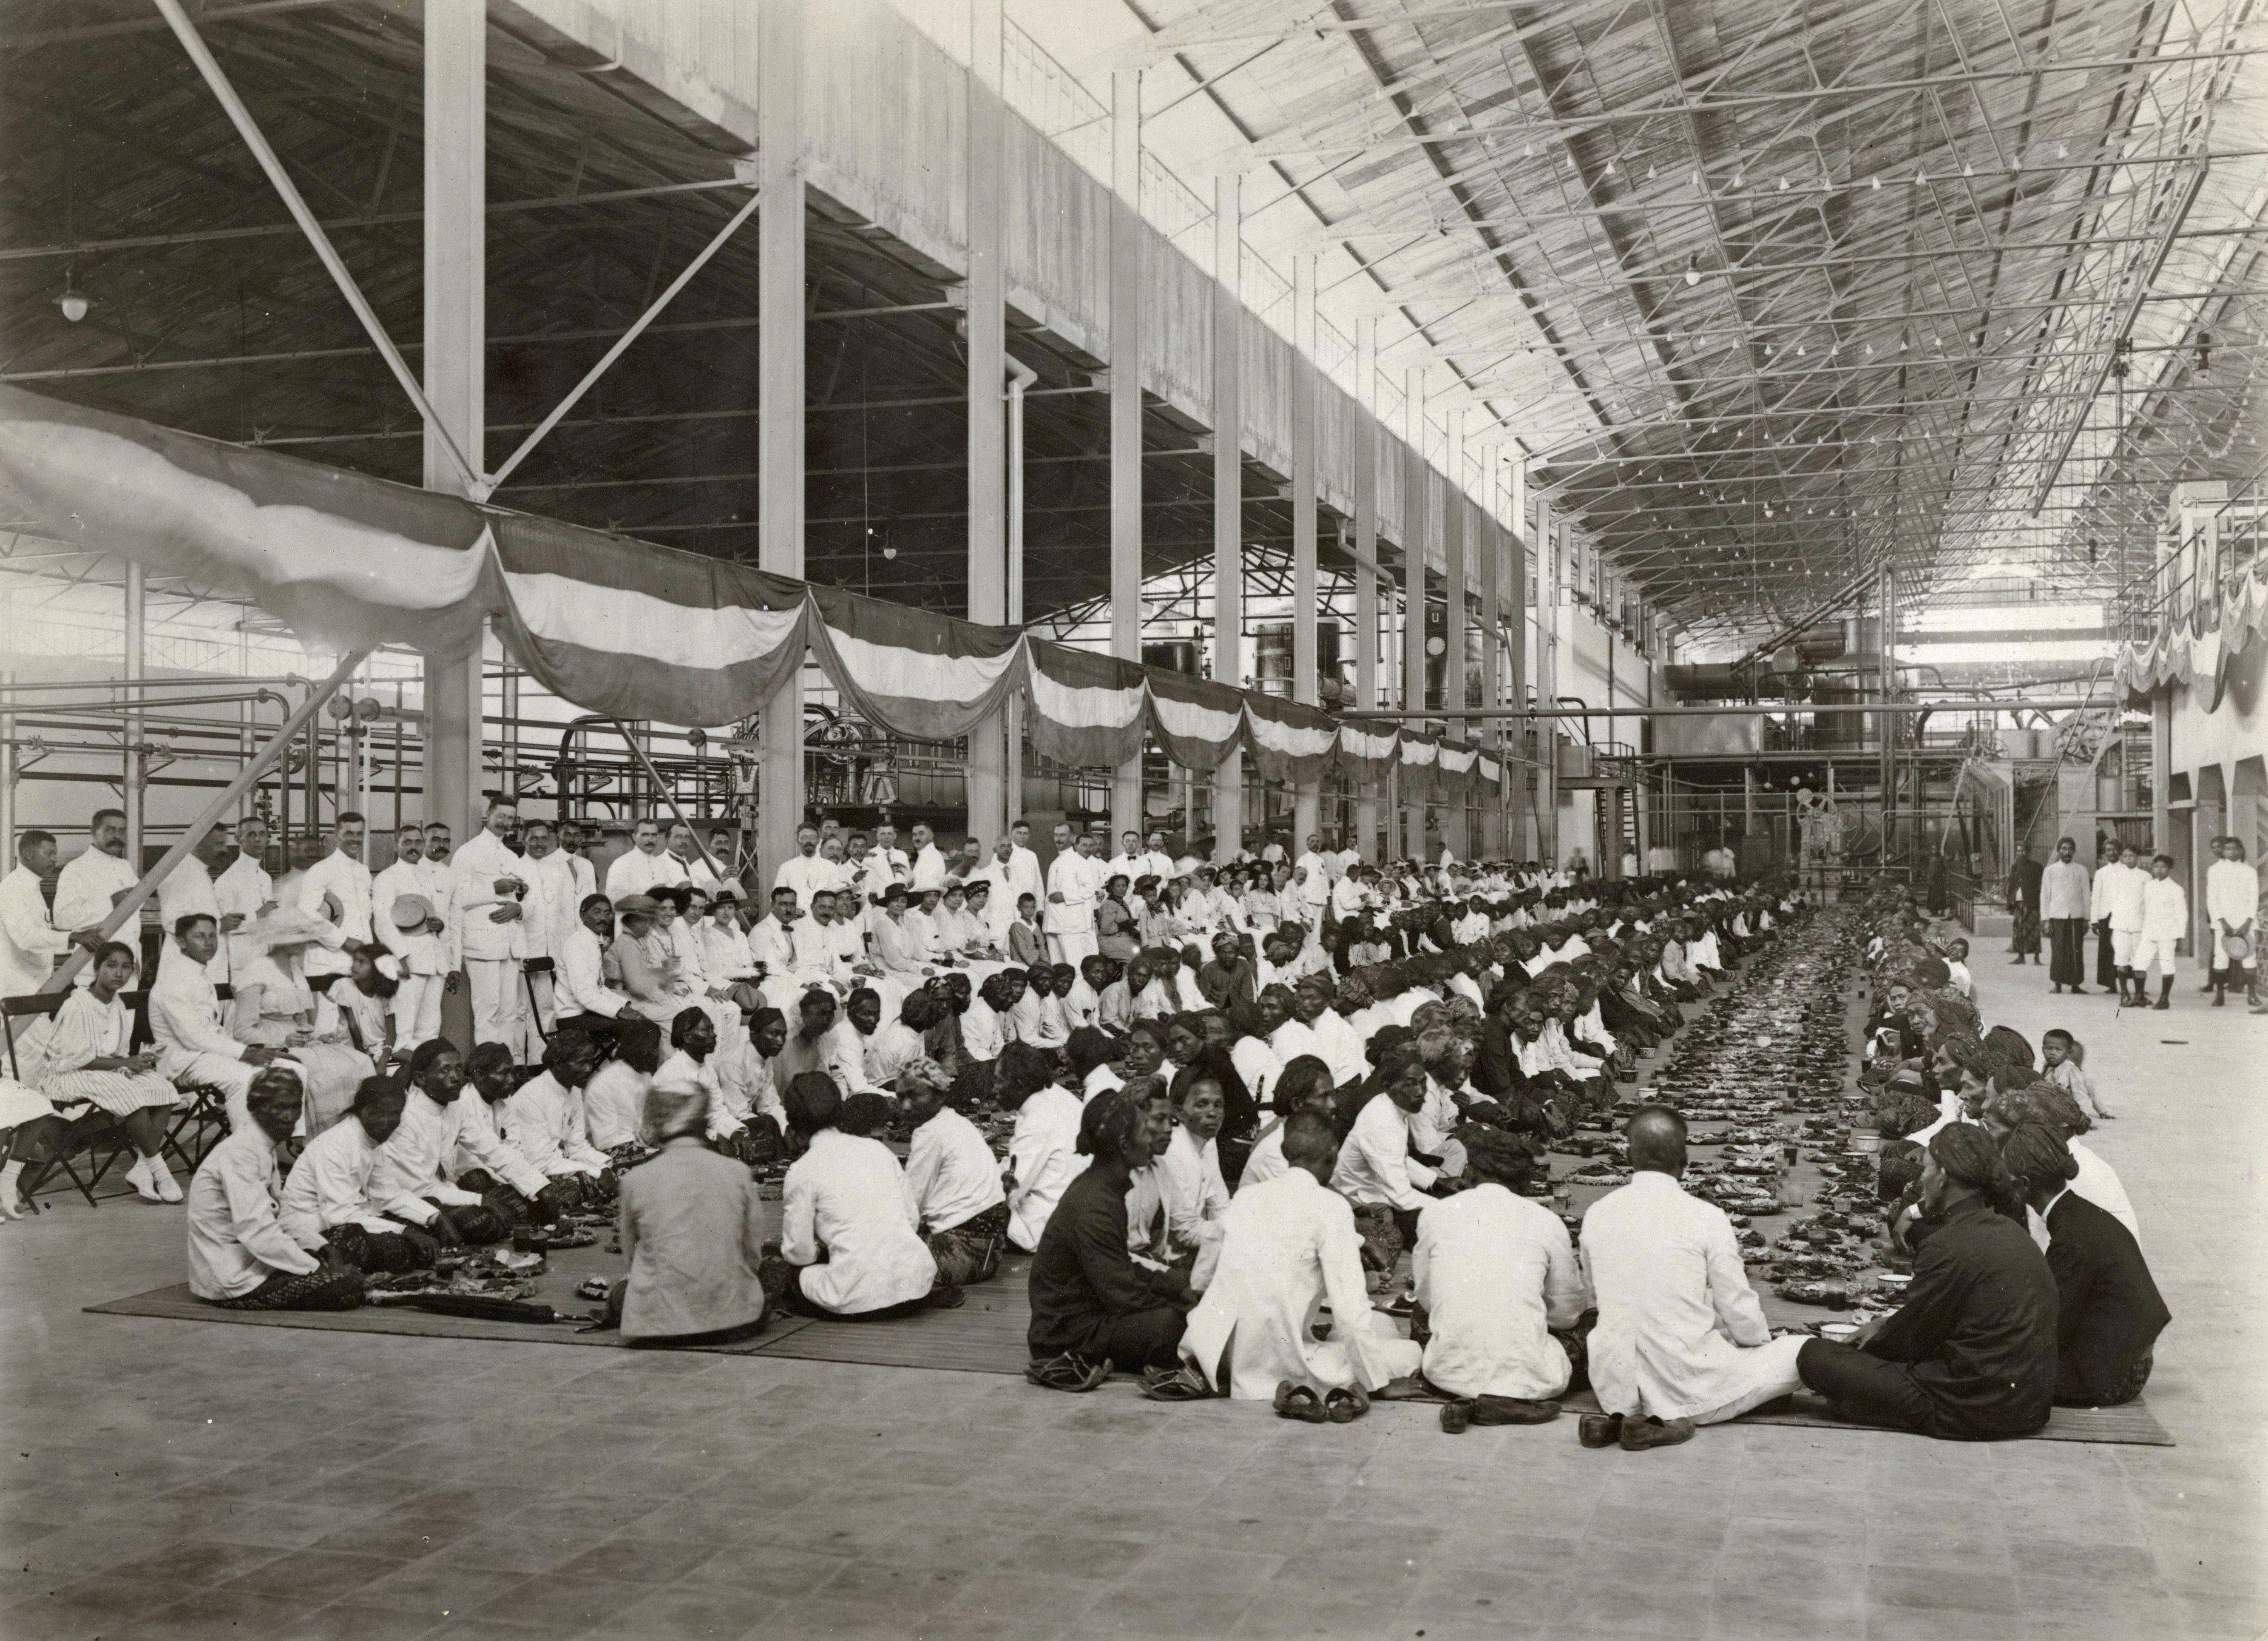 Selamatan Pembukaan Pabrik Gula Tjepiring 1917